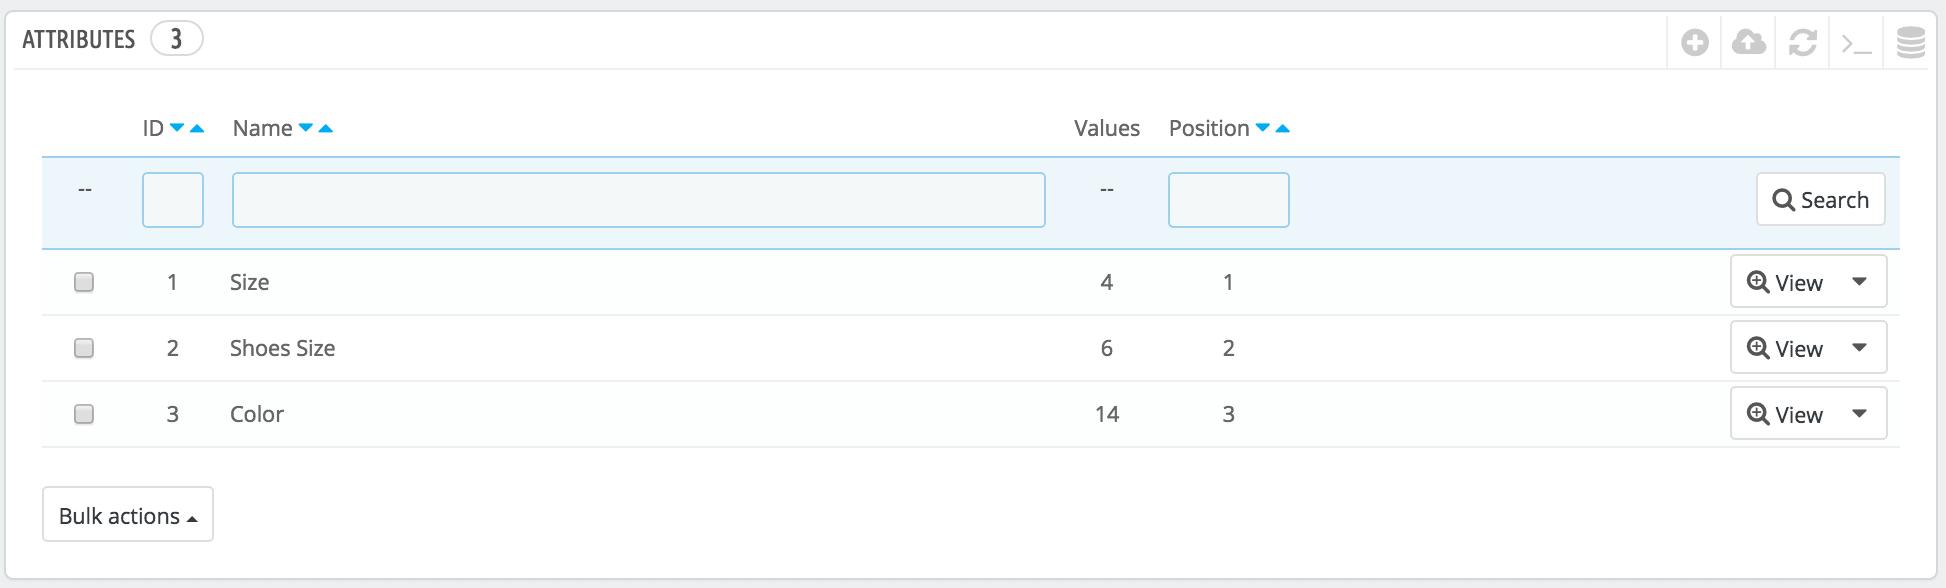 PrestaShop Attributes List